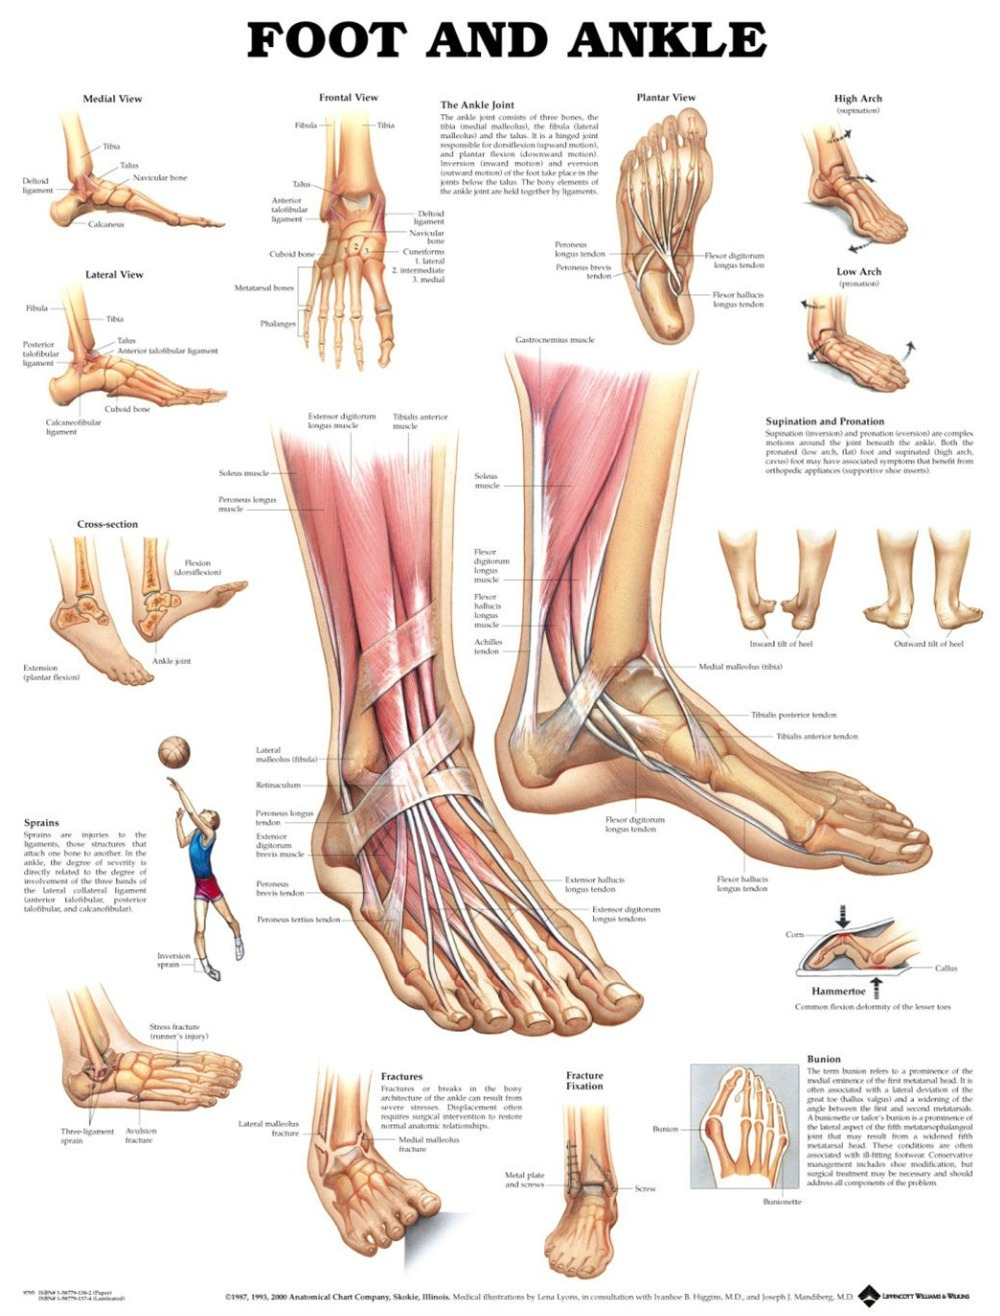 Qunexc 24X36 INCH / Human Body Anatomical Chart Muscular System ...